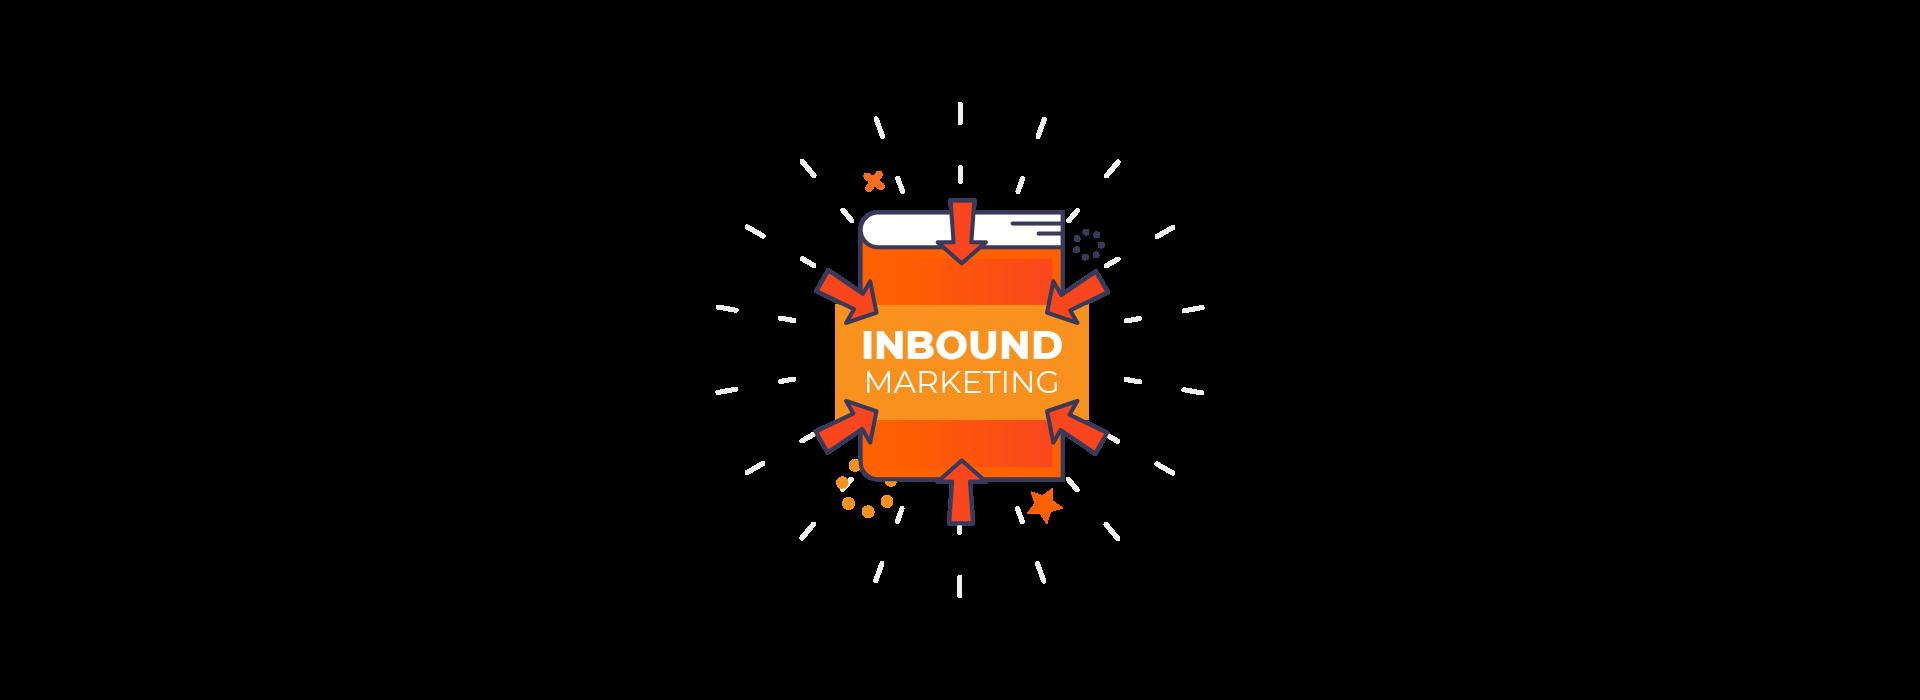 Inbound-Marketing-Guide-hero-desktop